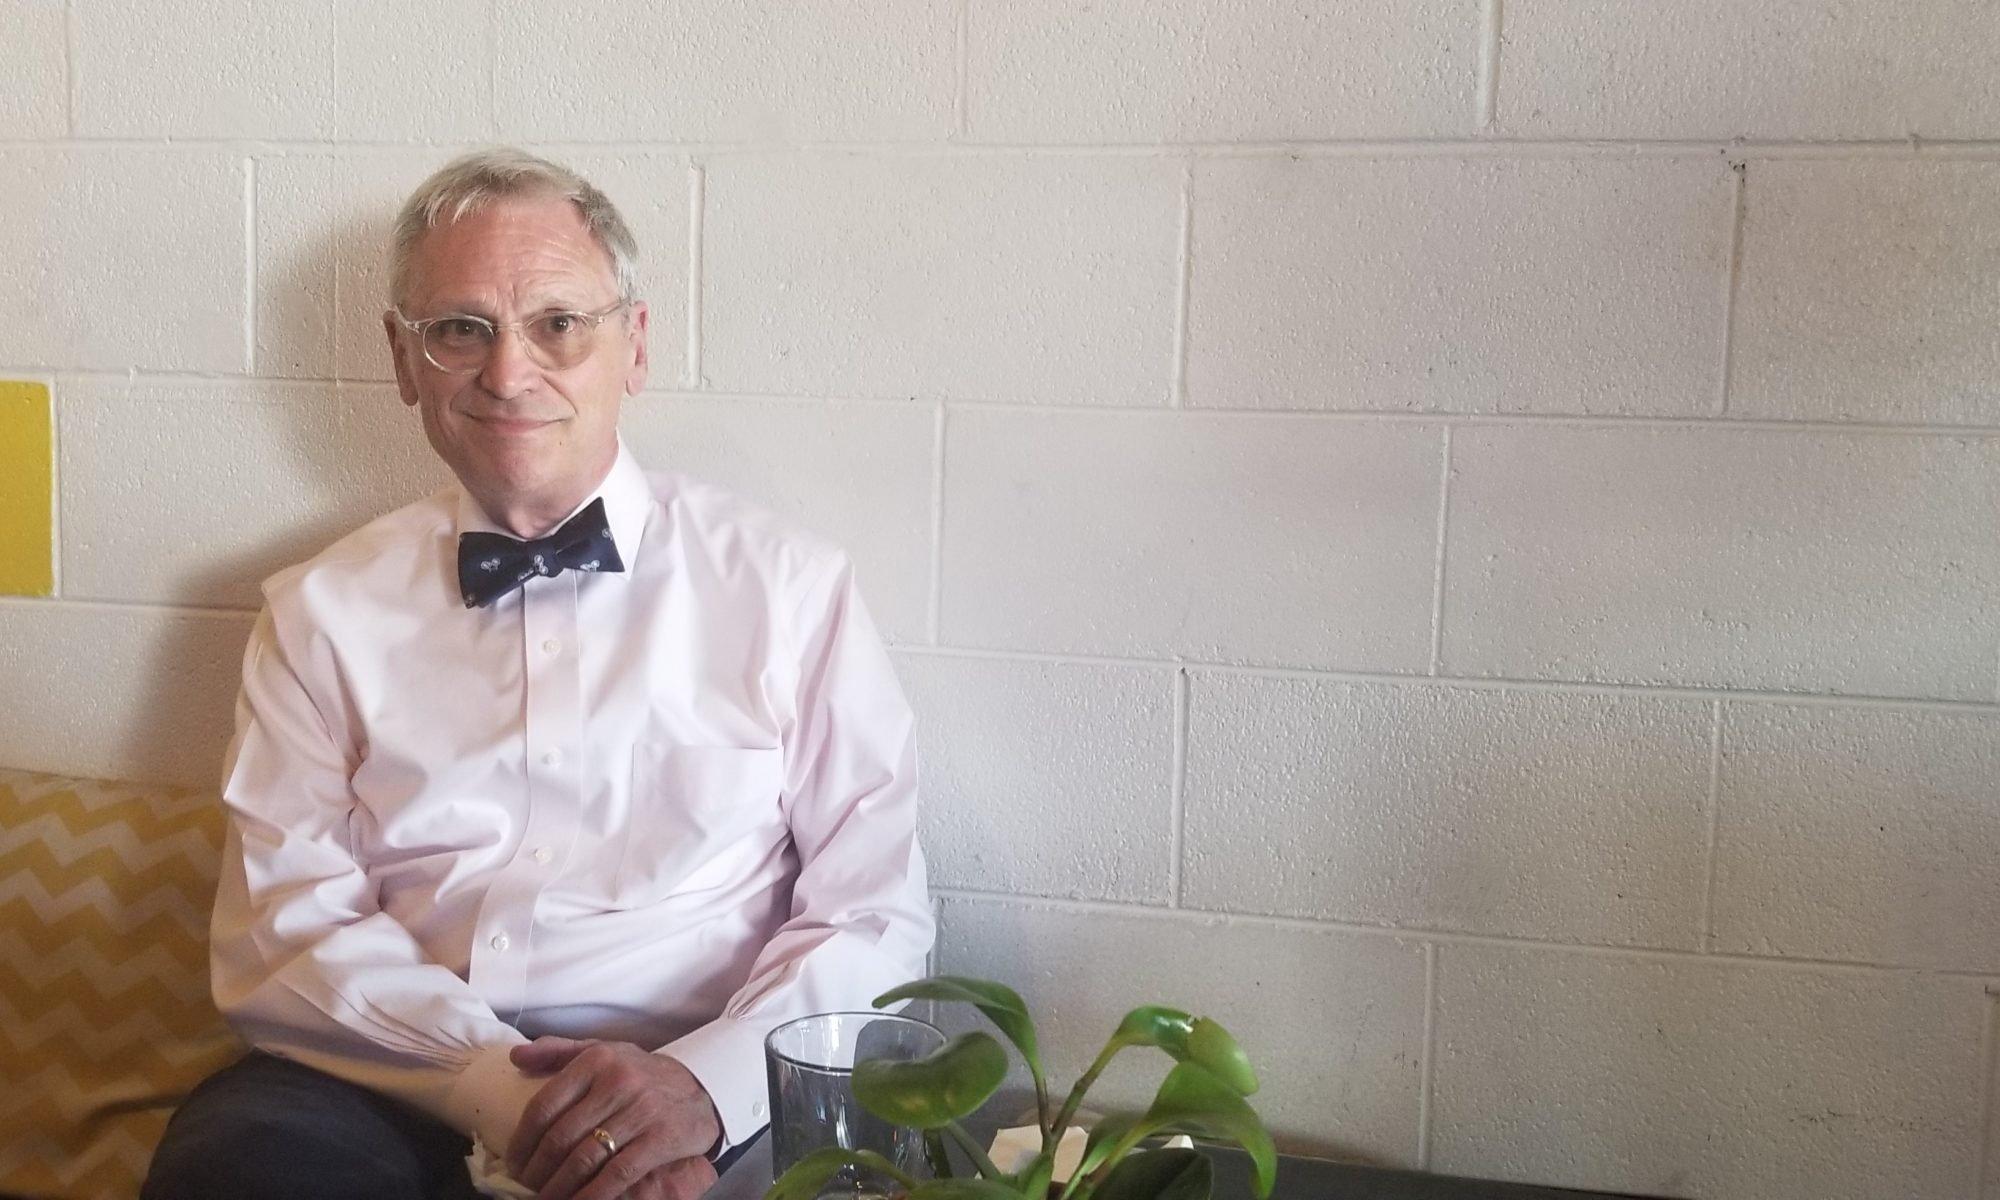 Congressman Earl Blumenauer says marijuana legalization outlook cloudy short-term, bright long-term